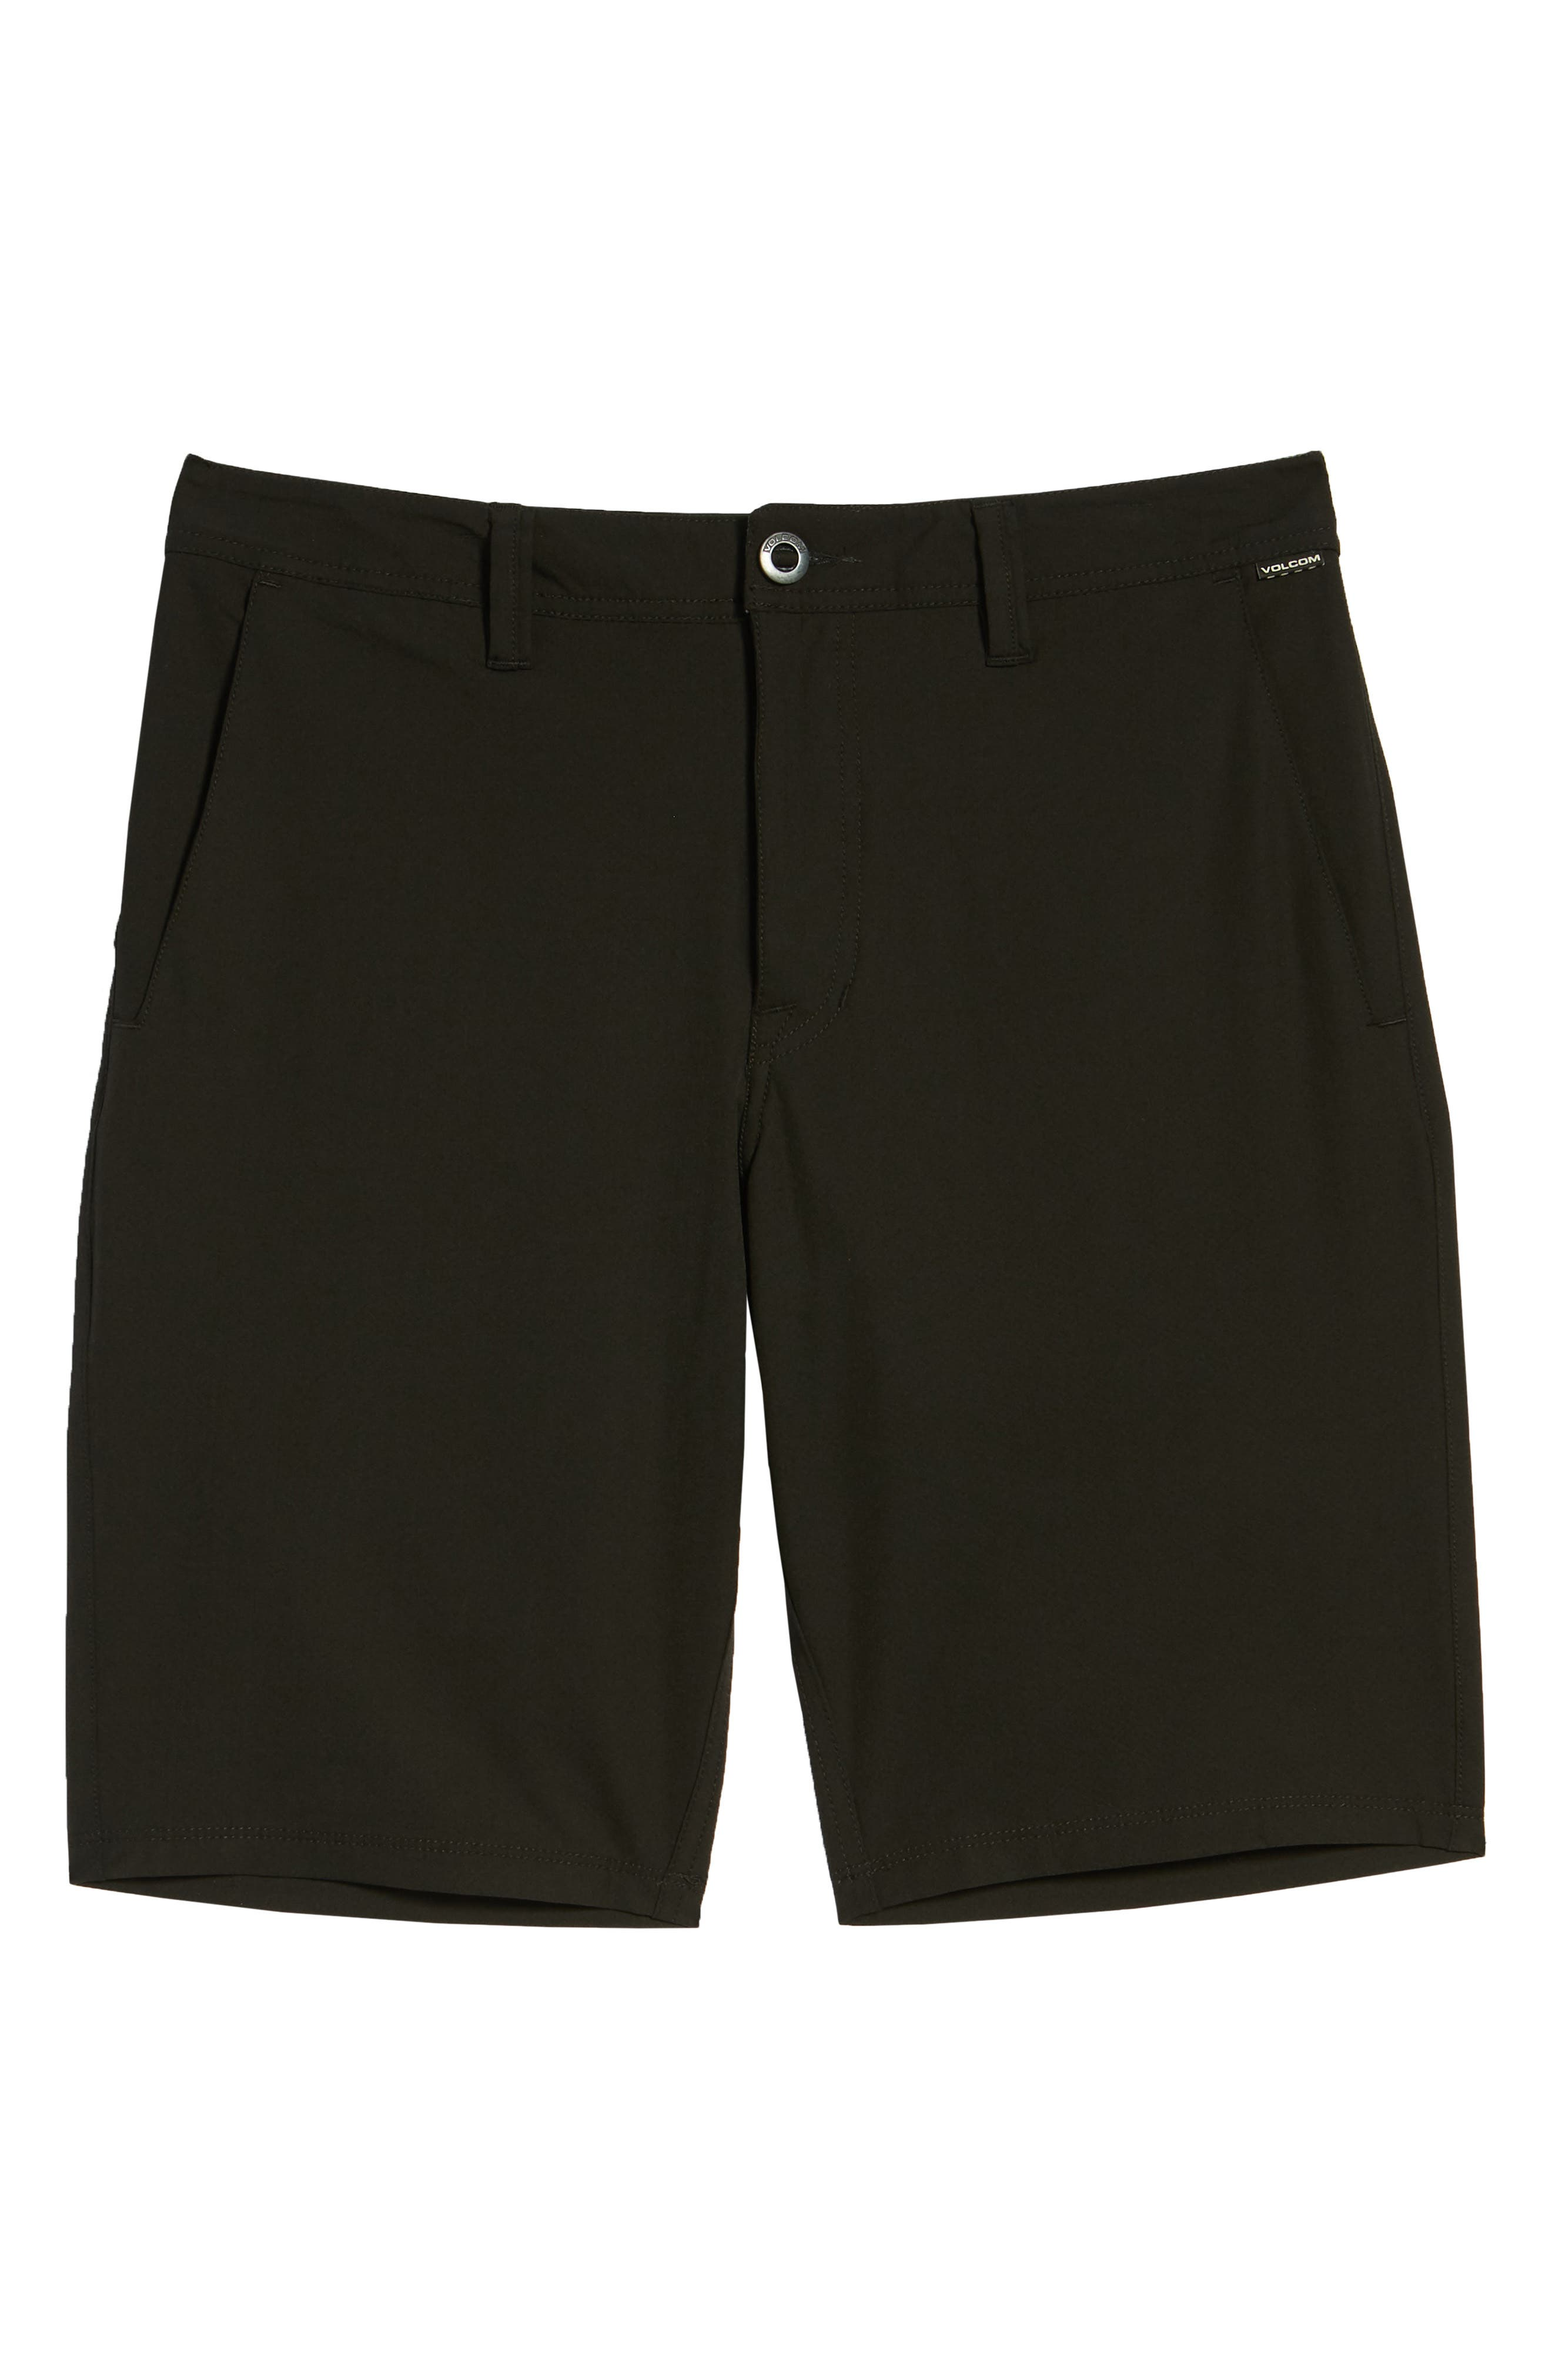 SNT Dry Hybrid Shorts,                             Alternate thumbnail 6, color,                             Black